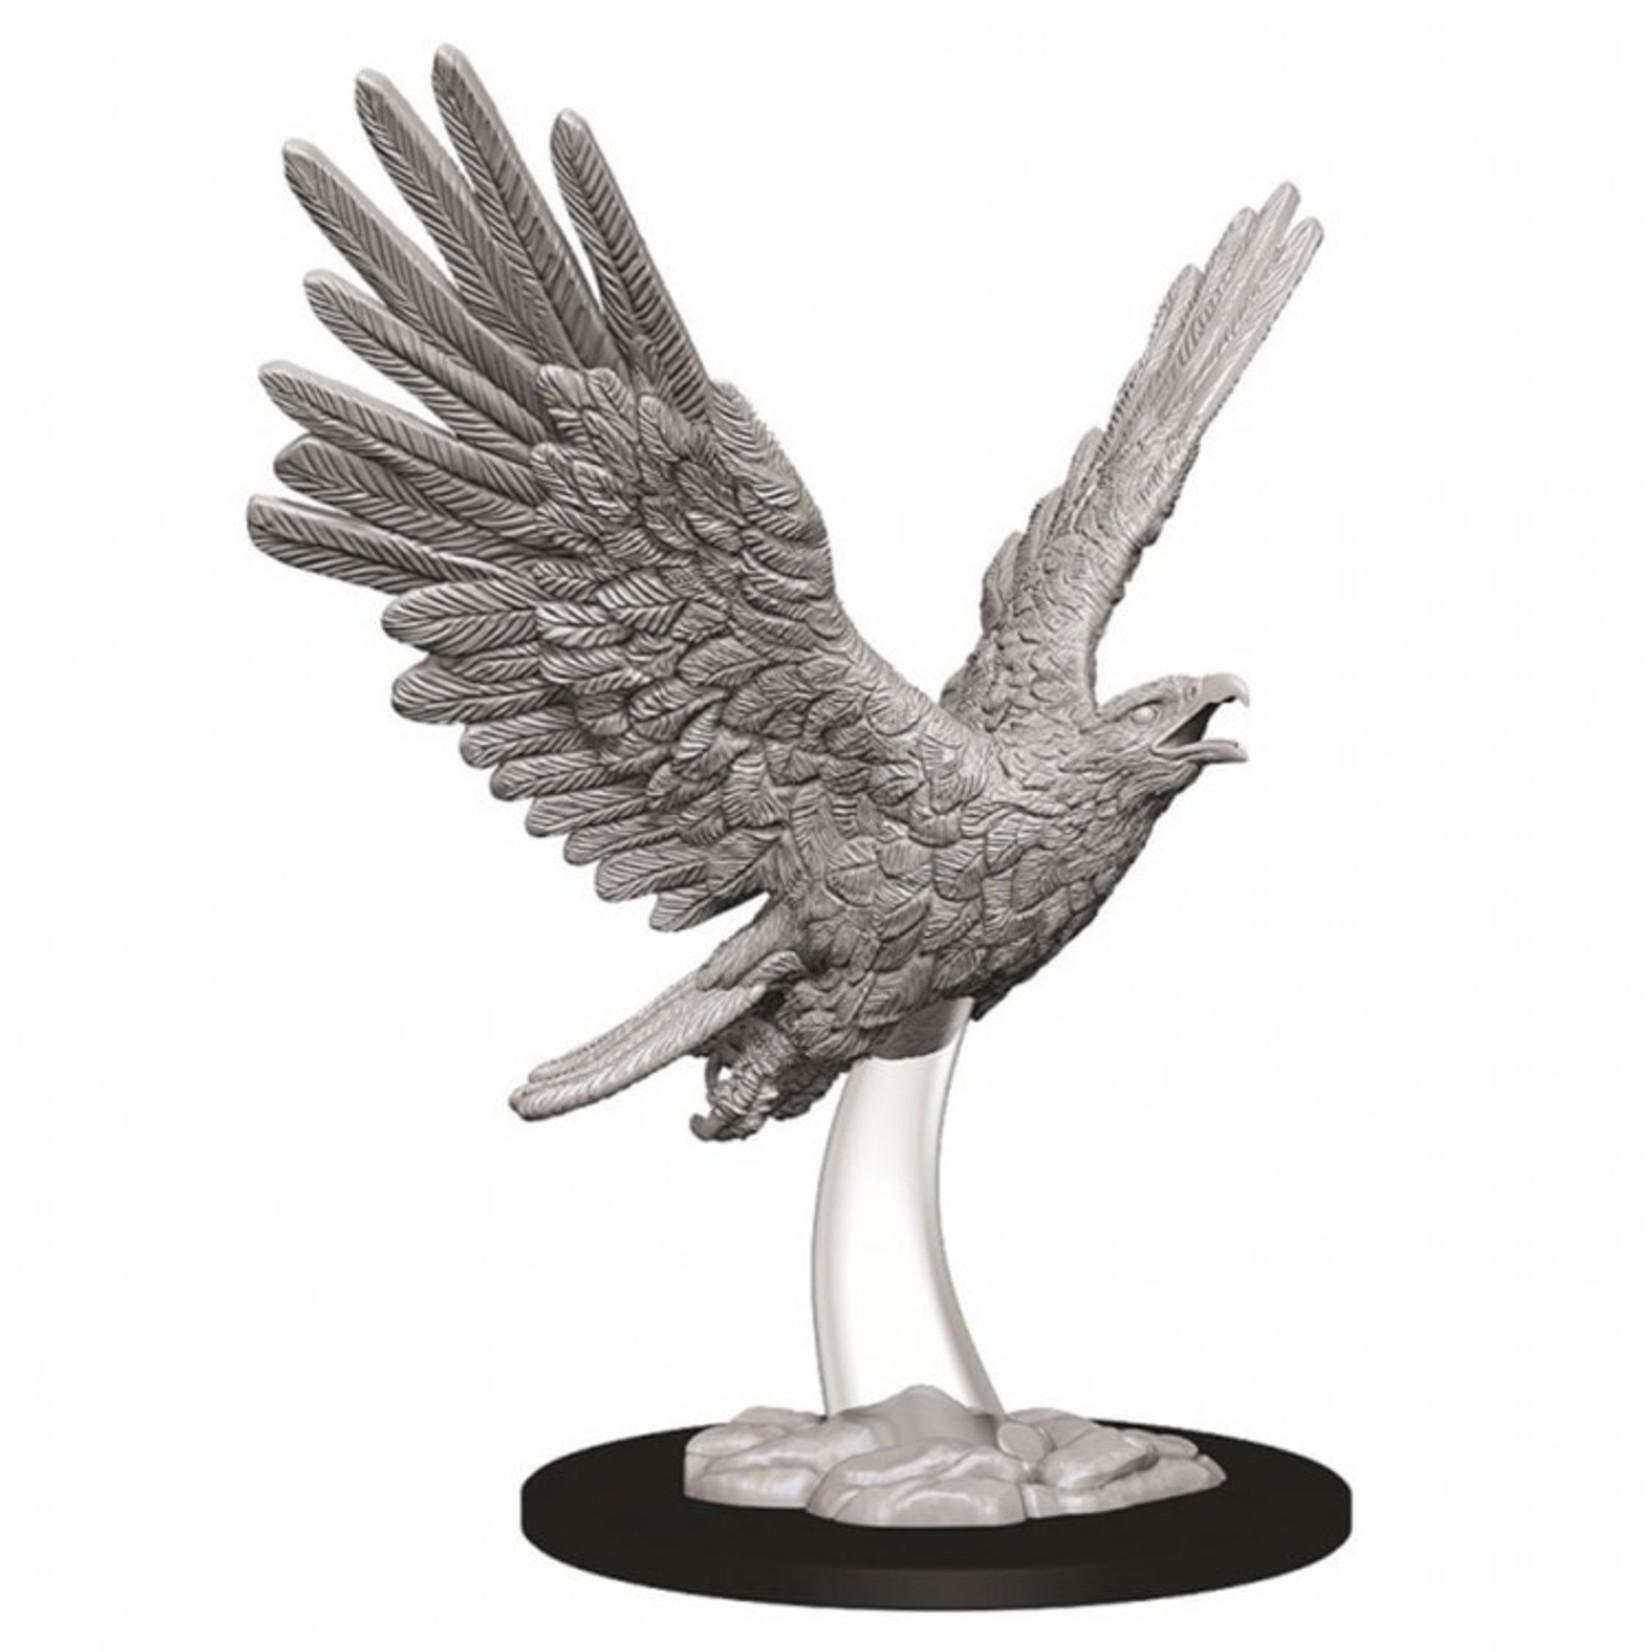 90202 Nolzur's Giant Eagle